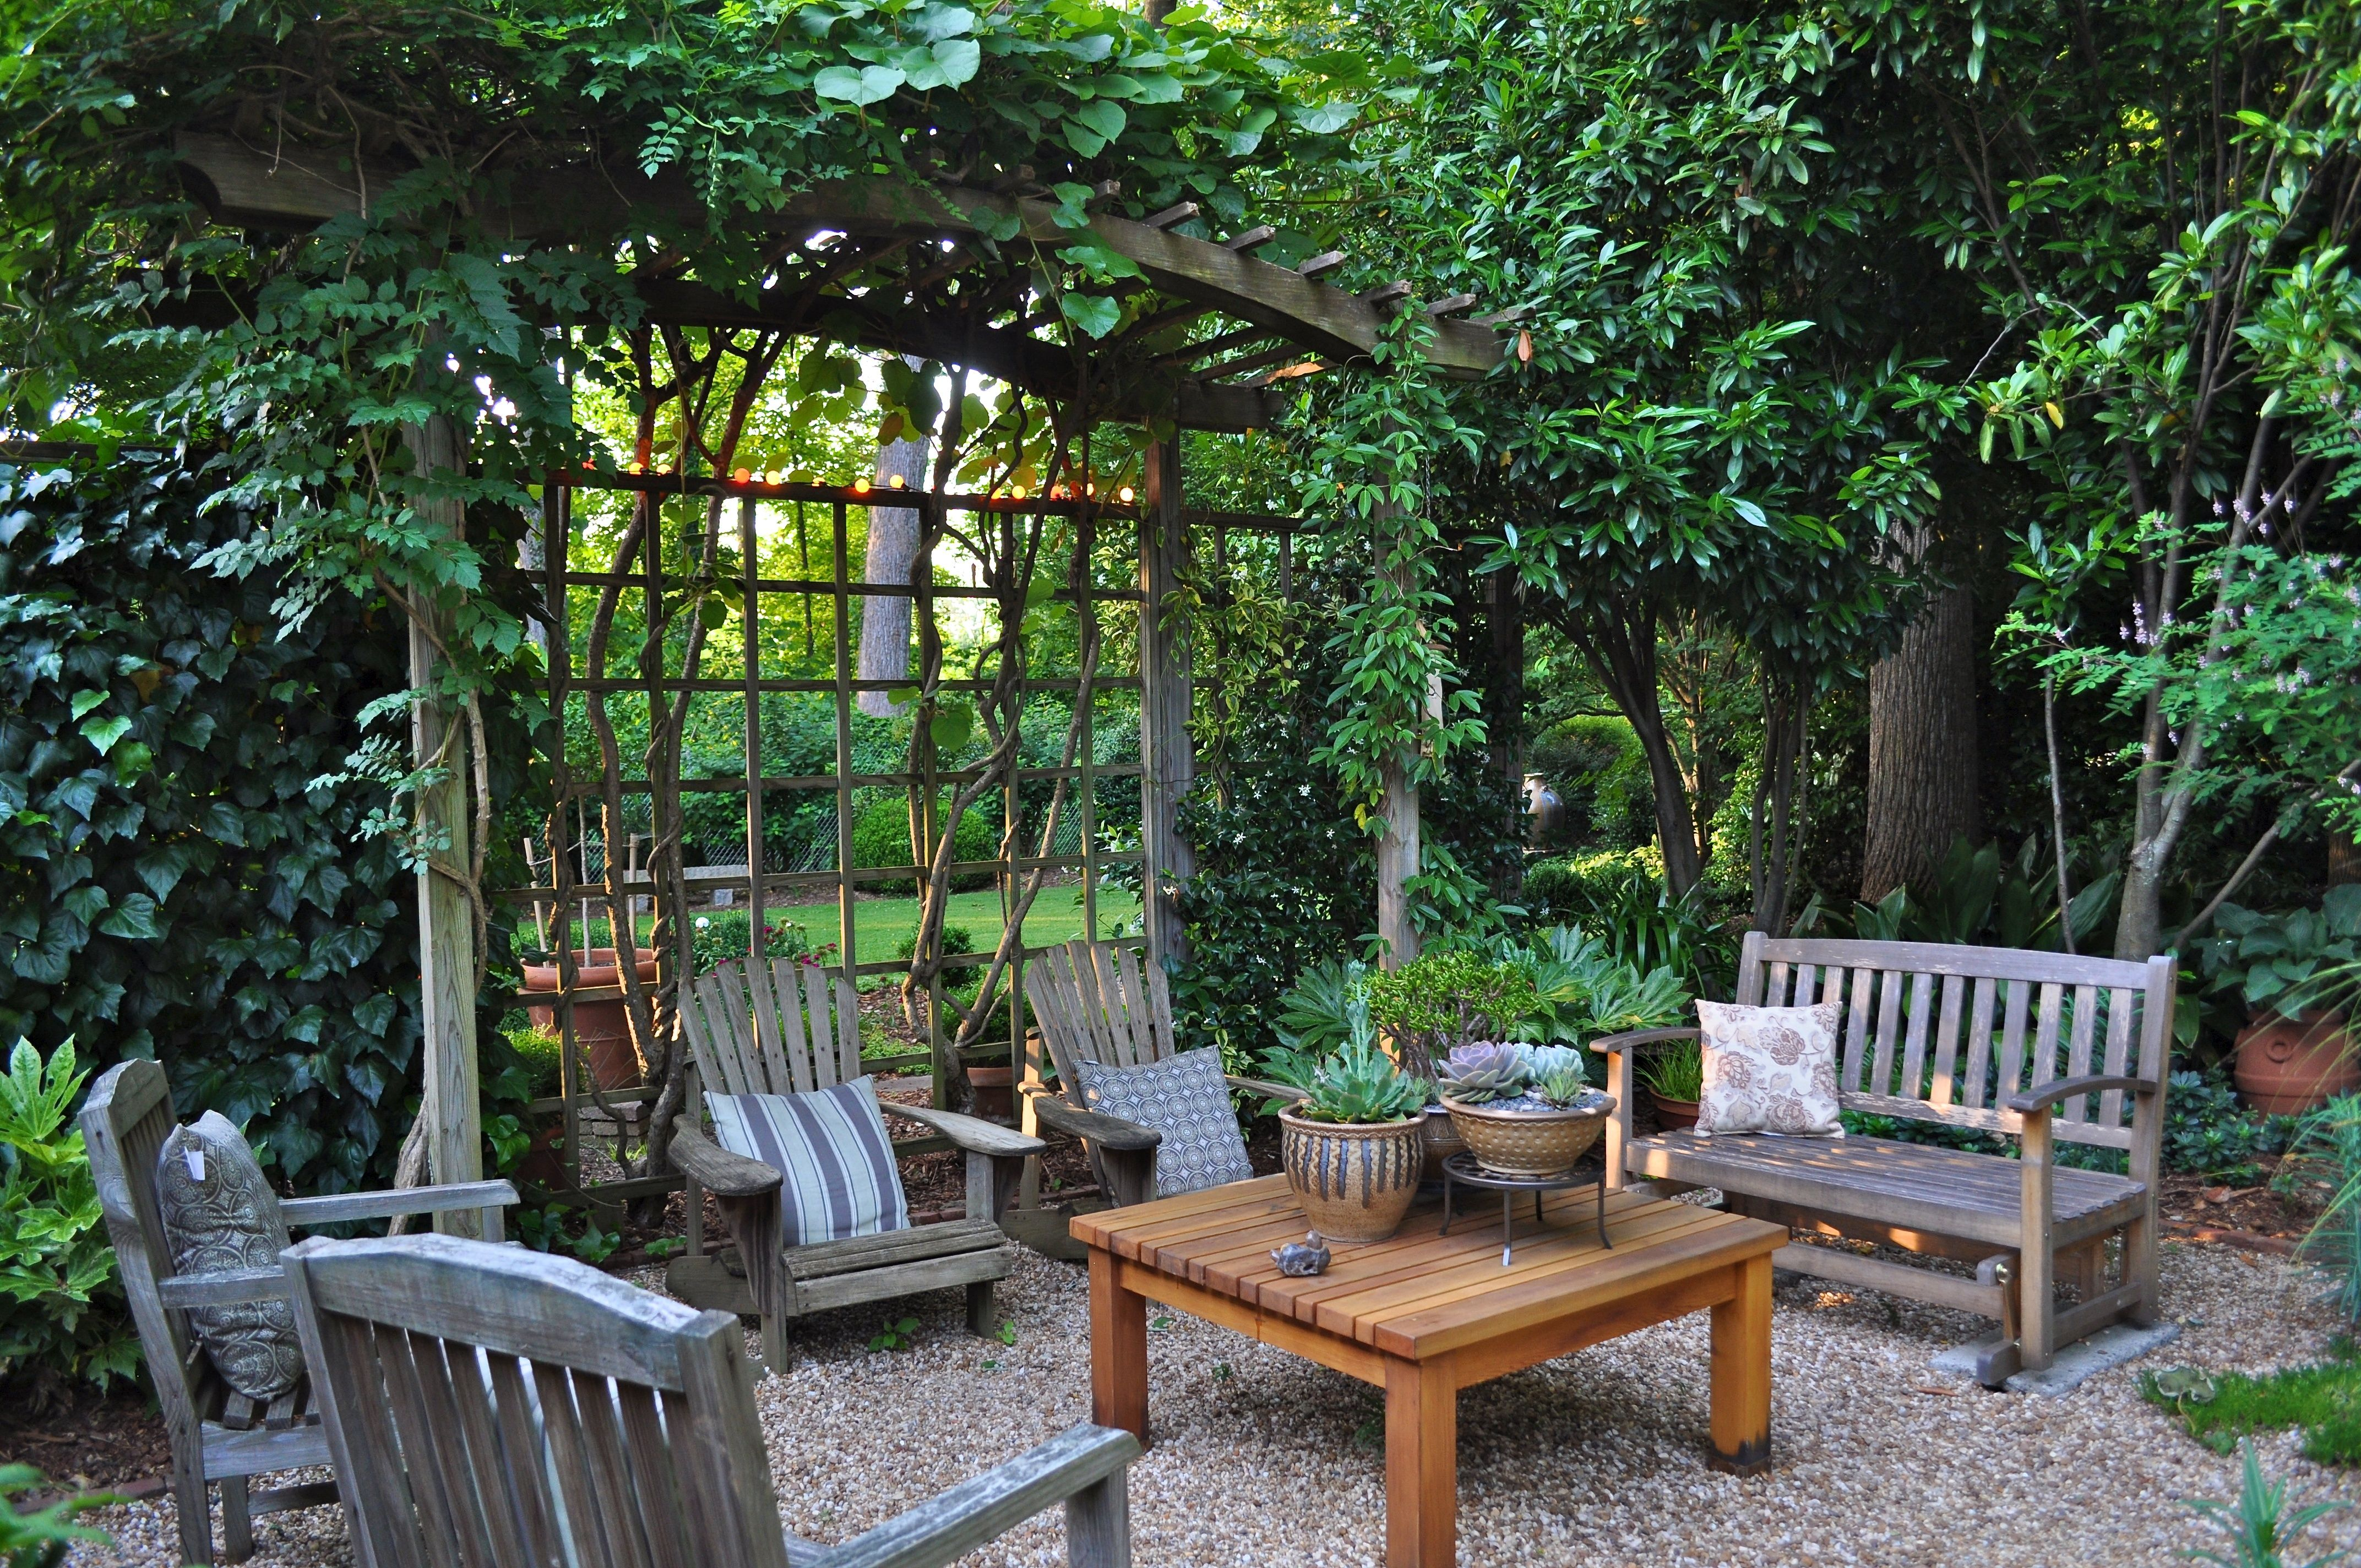 Rear Garden Seating Area | PATIO IDEAS | Pinterest on Back Garden Seating Area Ideas id=33818